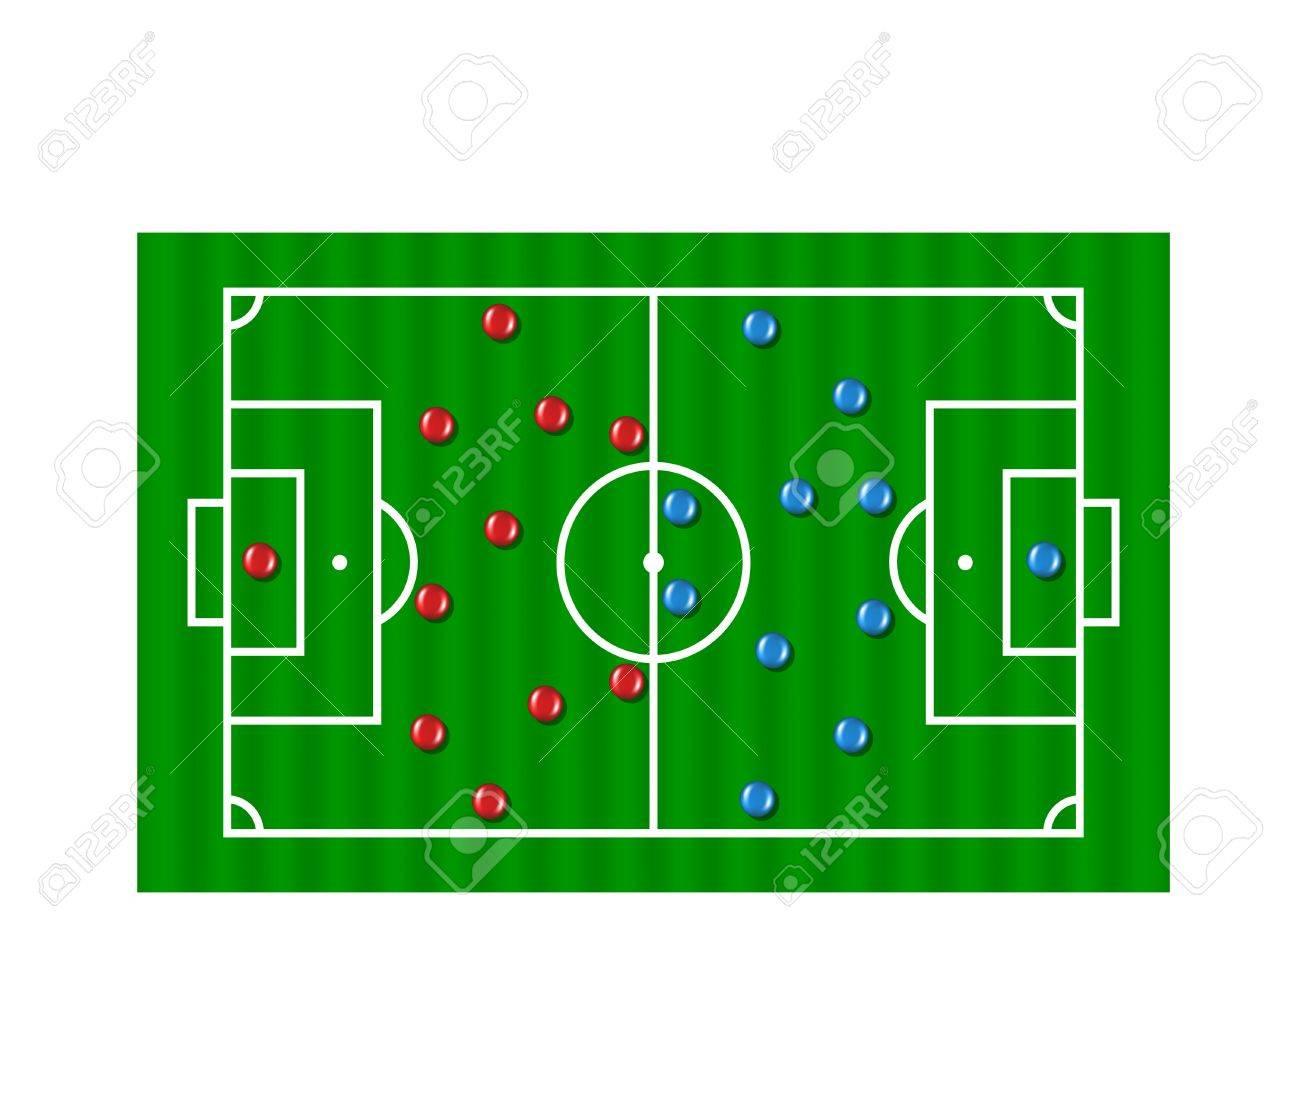 Football formation tactics Stock Vector - 15130928